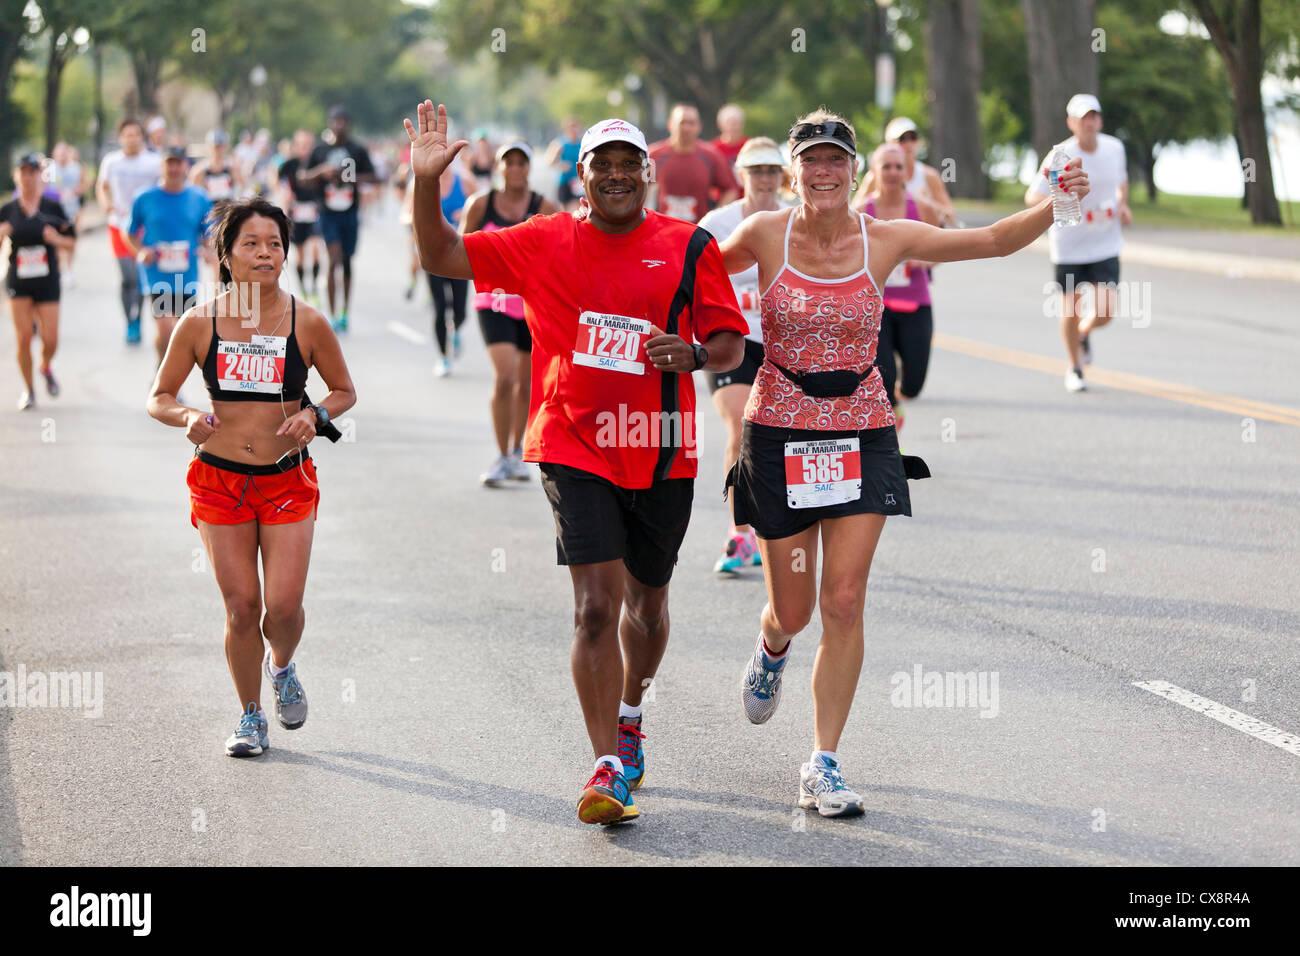 La maratona corridori - USA Immagini Stock